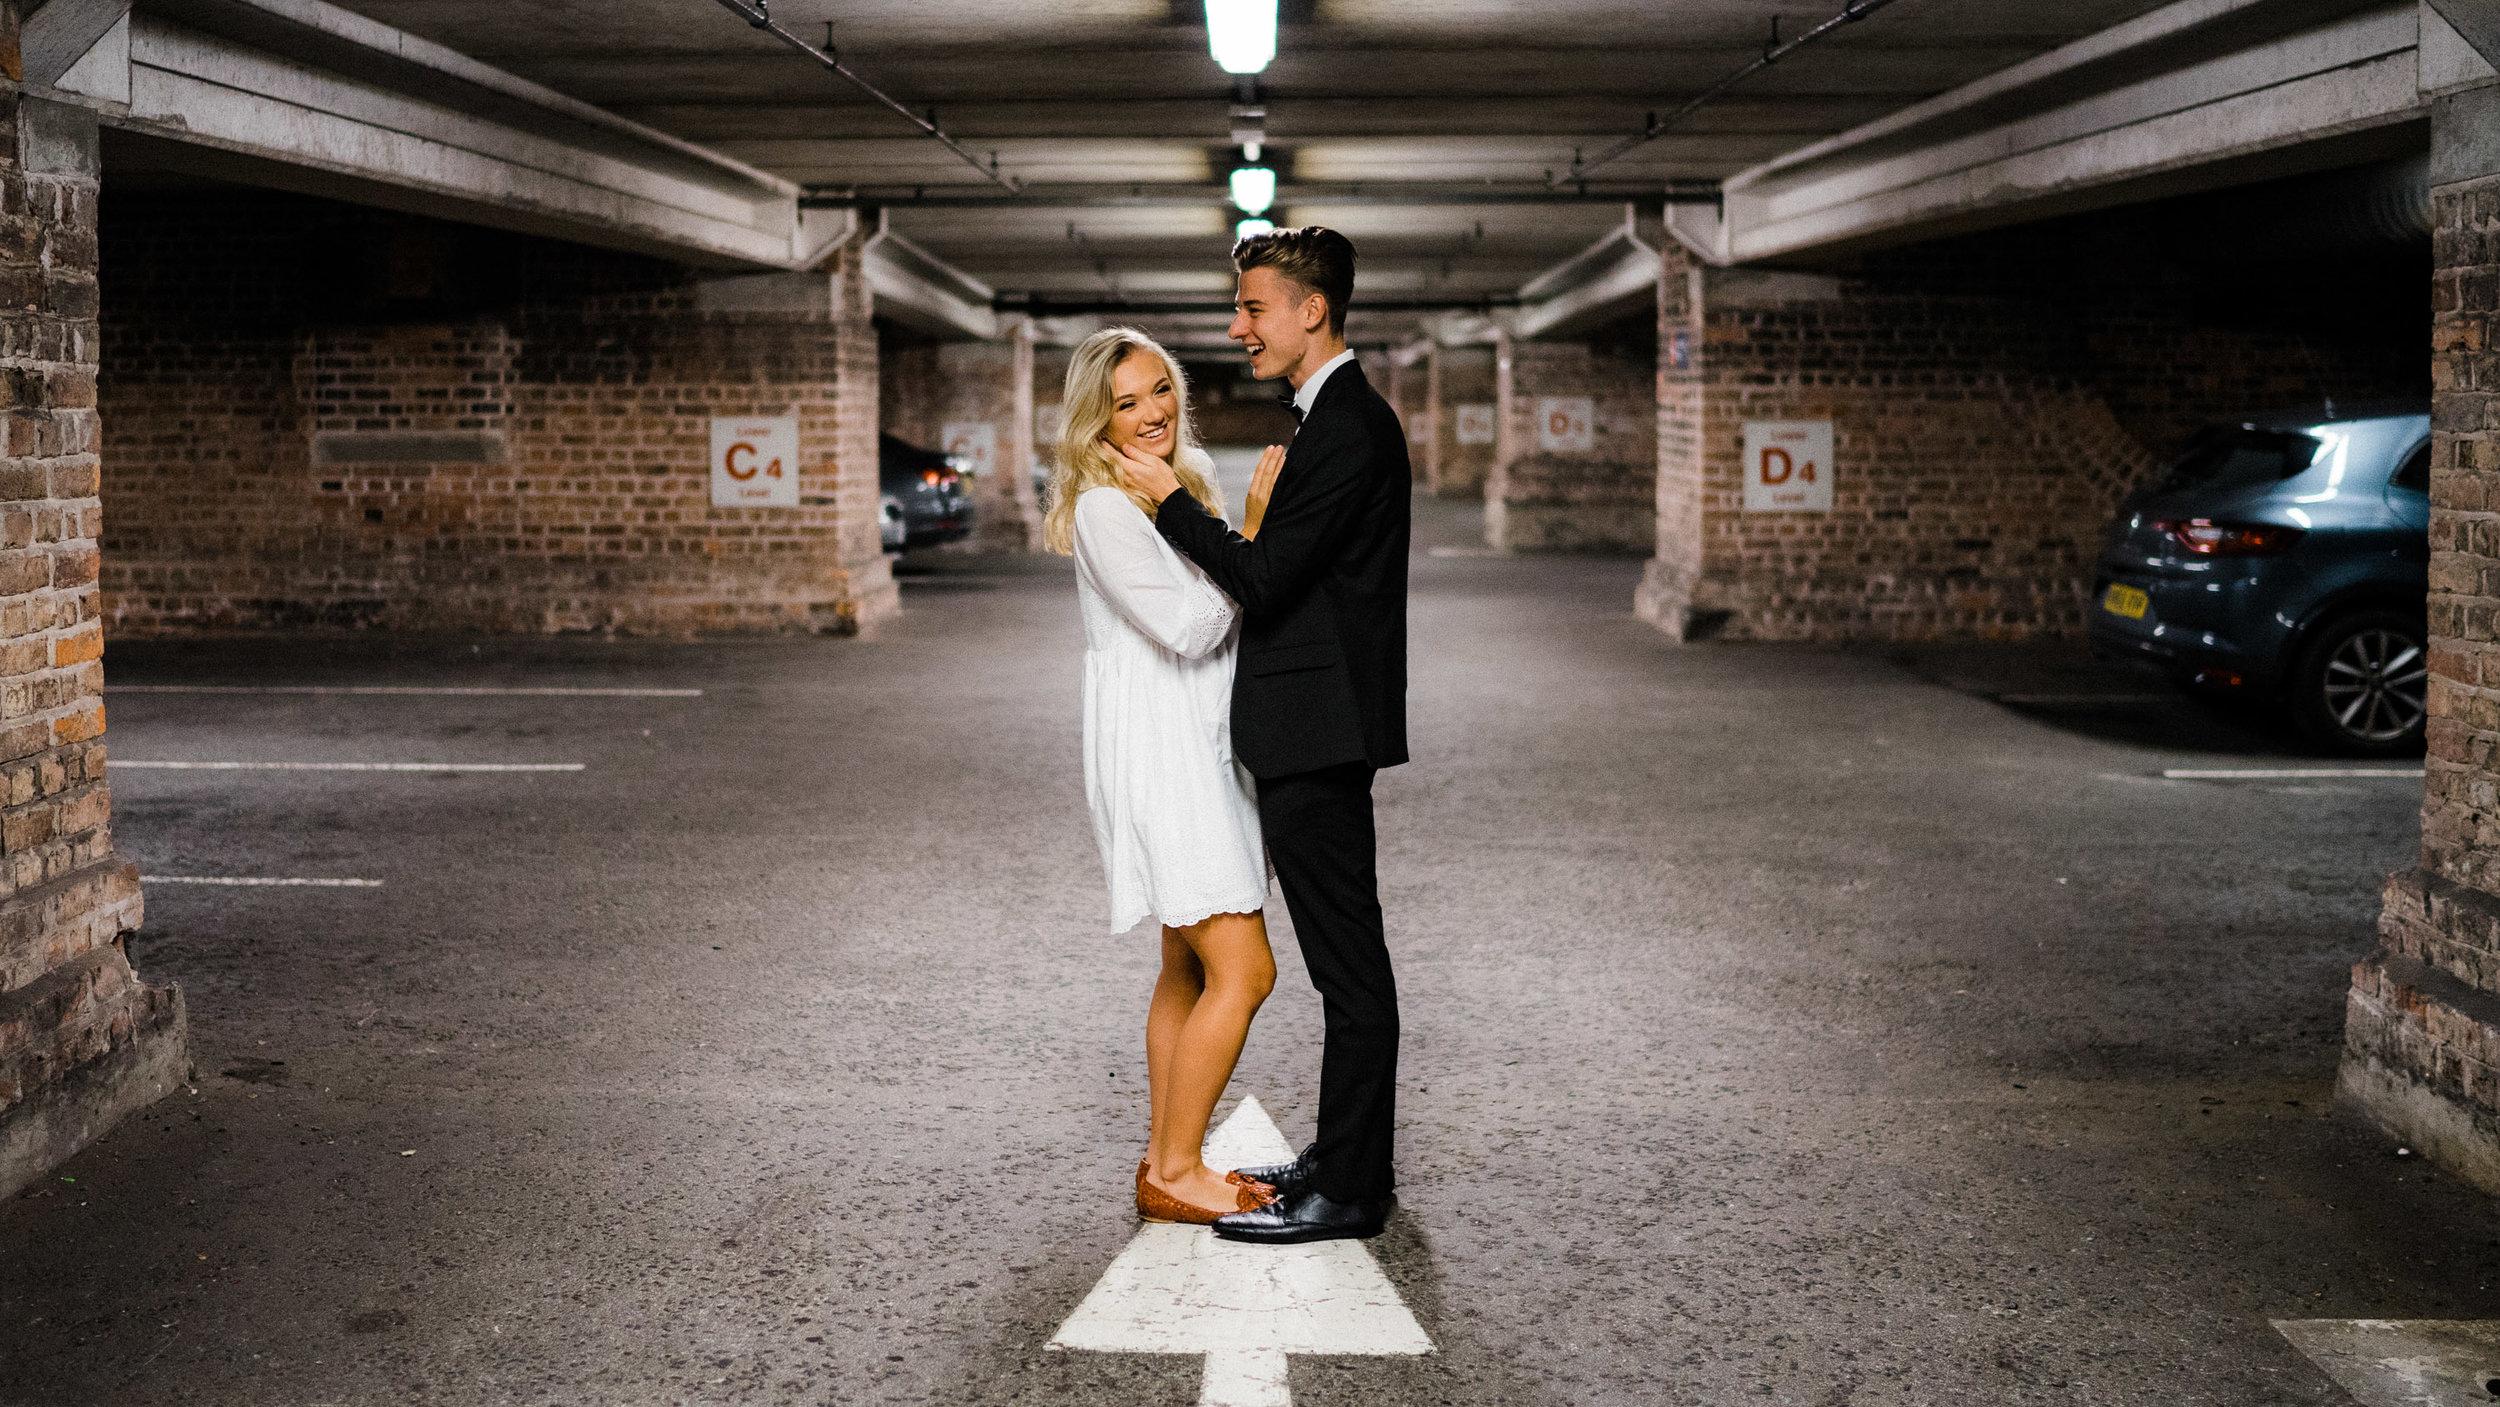 www.bytomw.com - Tom Wright - Manchester & Lake District Wedding Photographer -01002.jpg